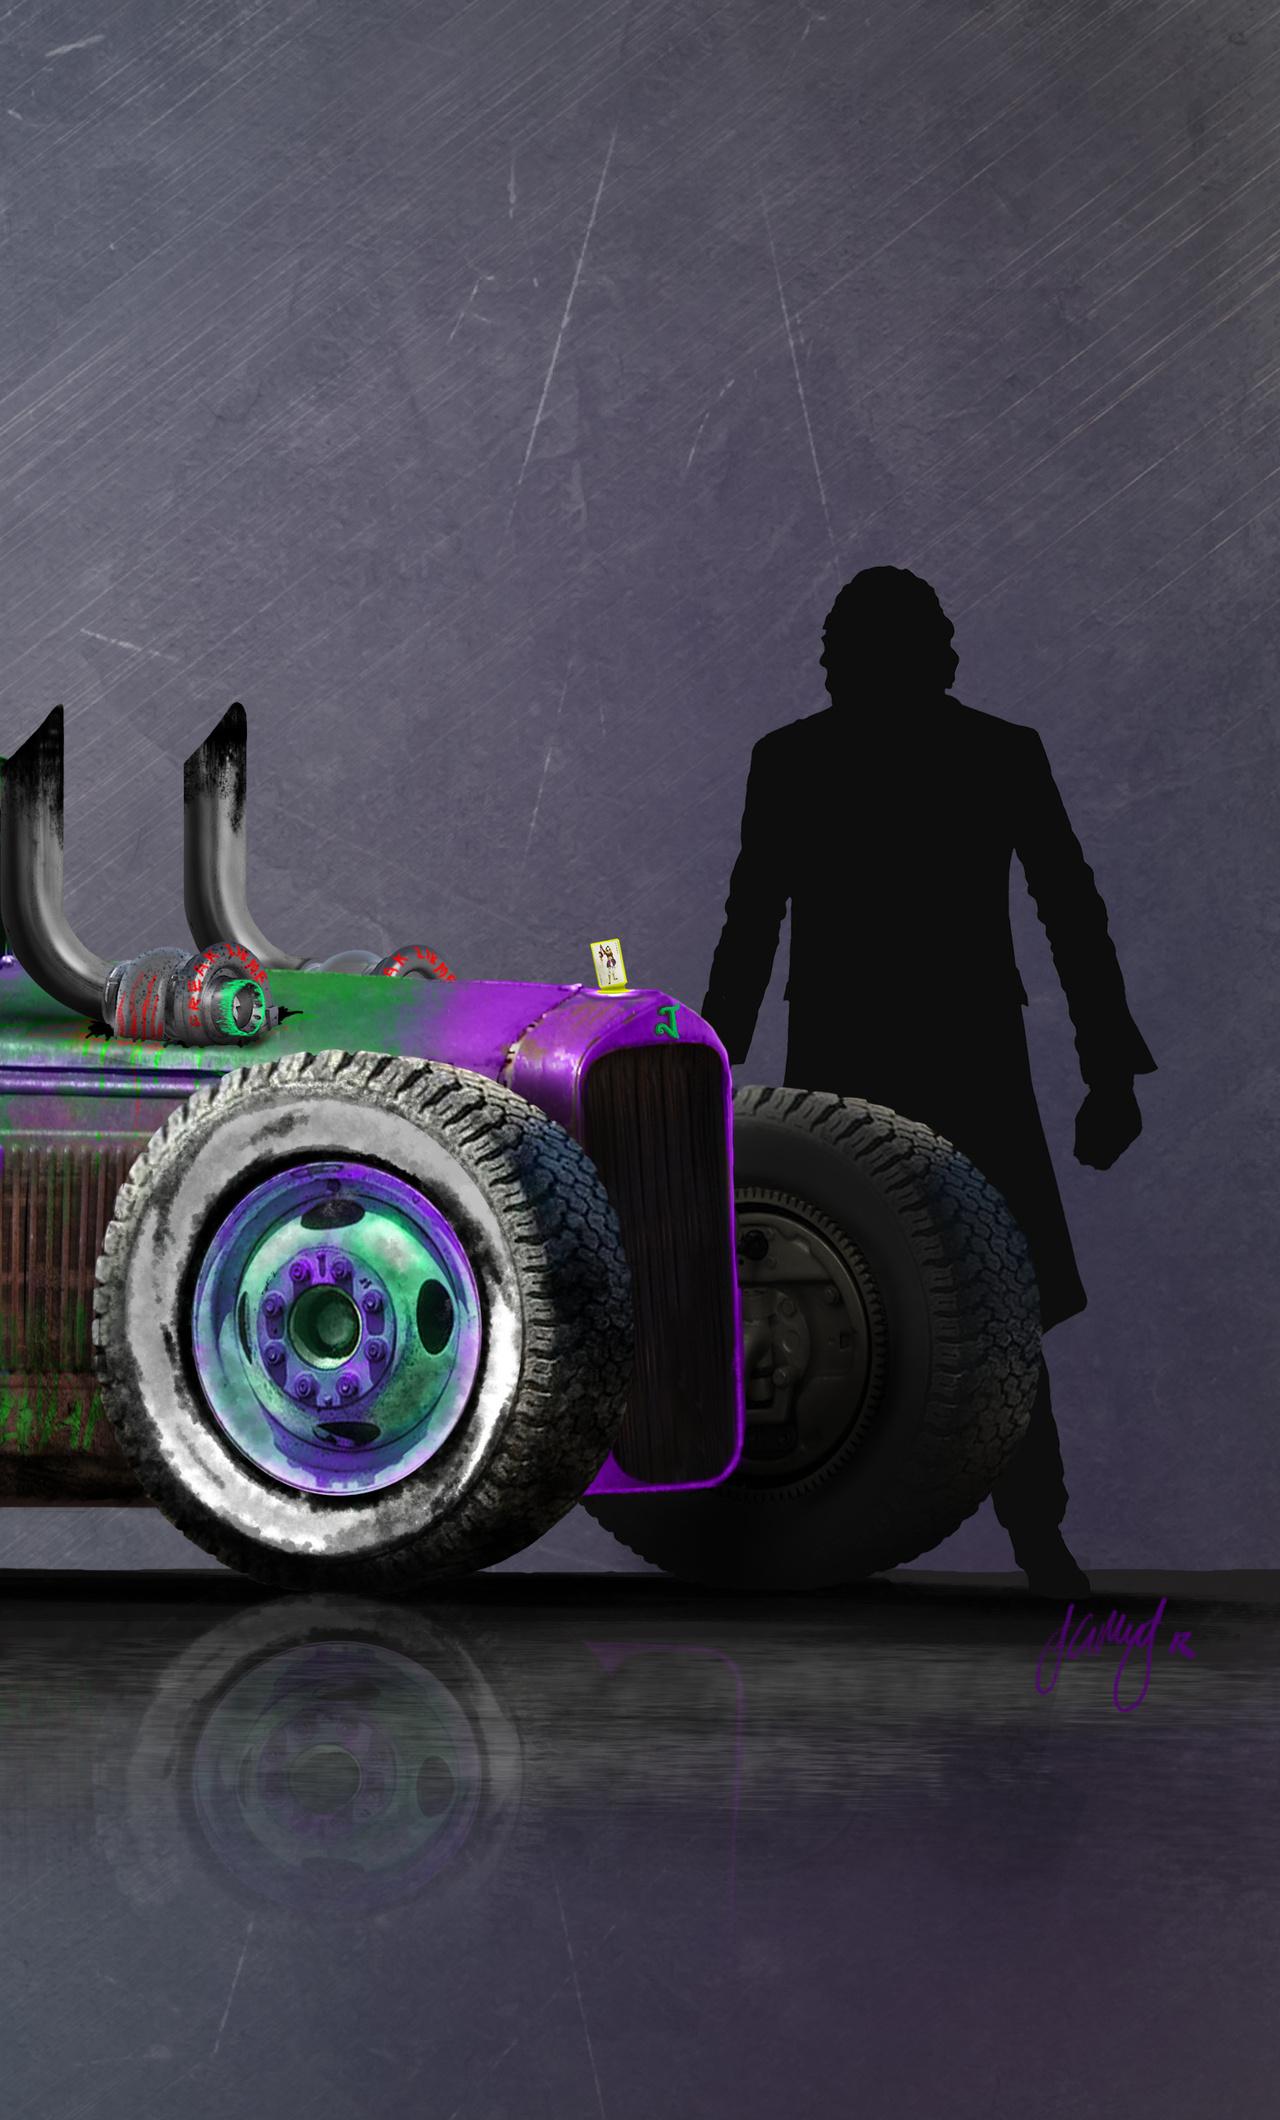 joker-motorcar-4k-qa.jpg